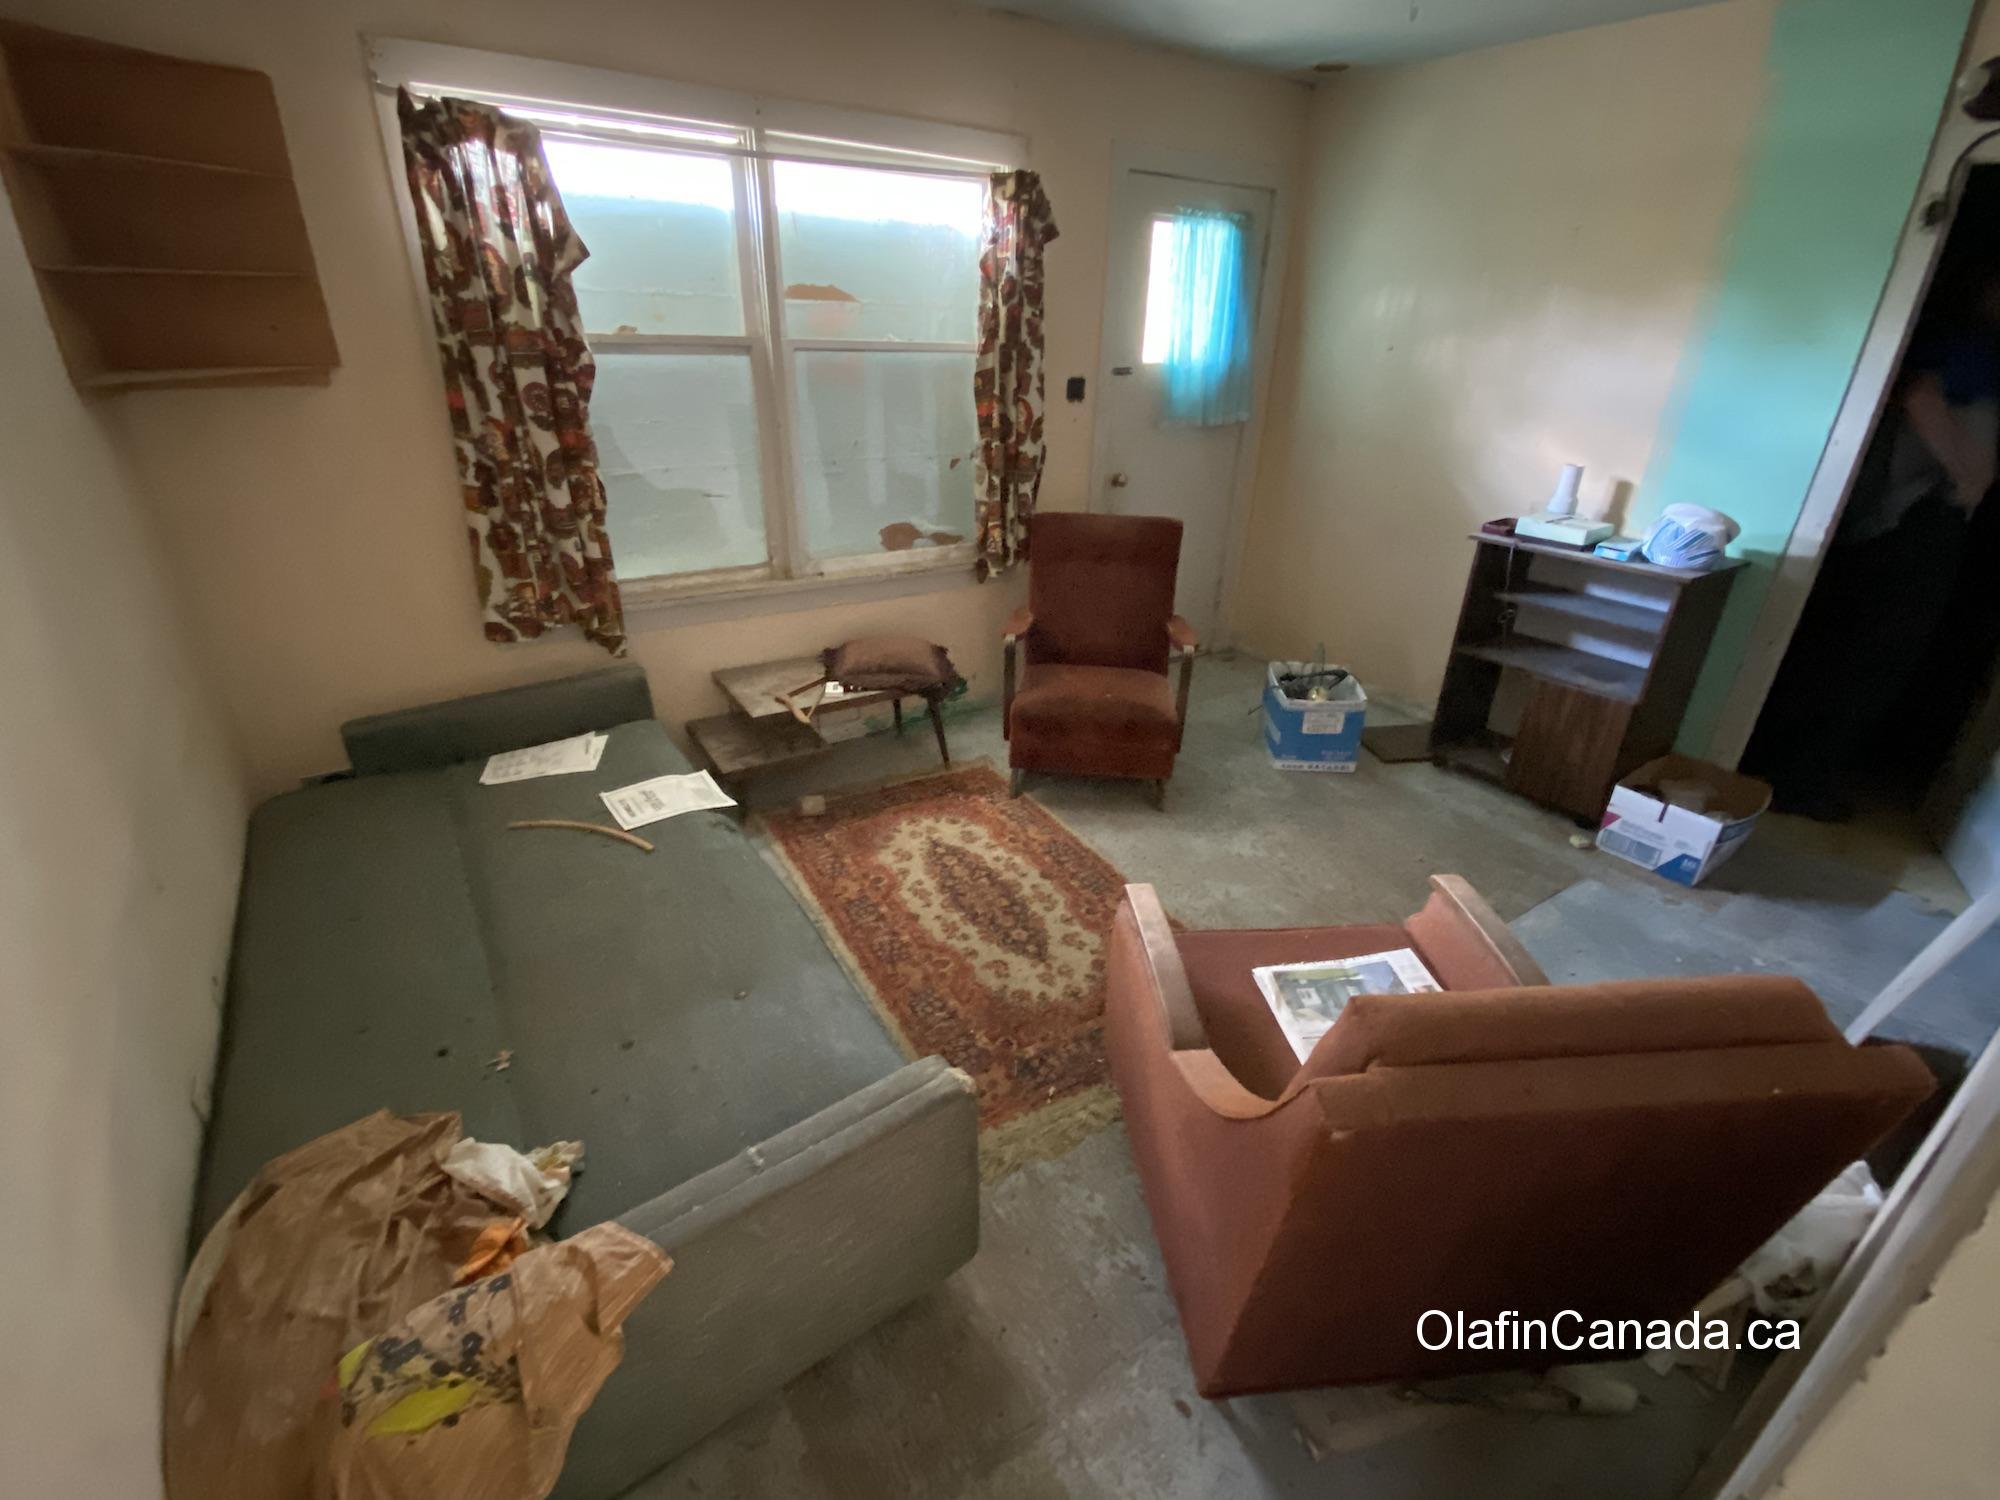 Interior house Bradian, BC. #olafincanada #britishcolumbia #discoverbc #abandonedbc #bradian